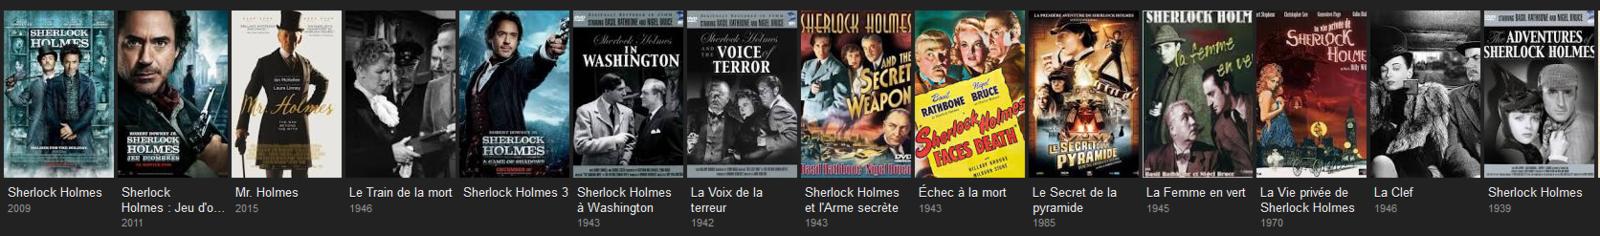 SIR ARTHUR CONAN DOYLE / AUTEUR DE SHERLOCK HOLMES